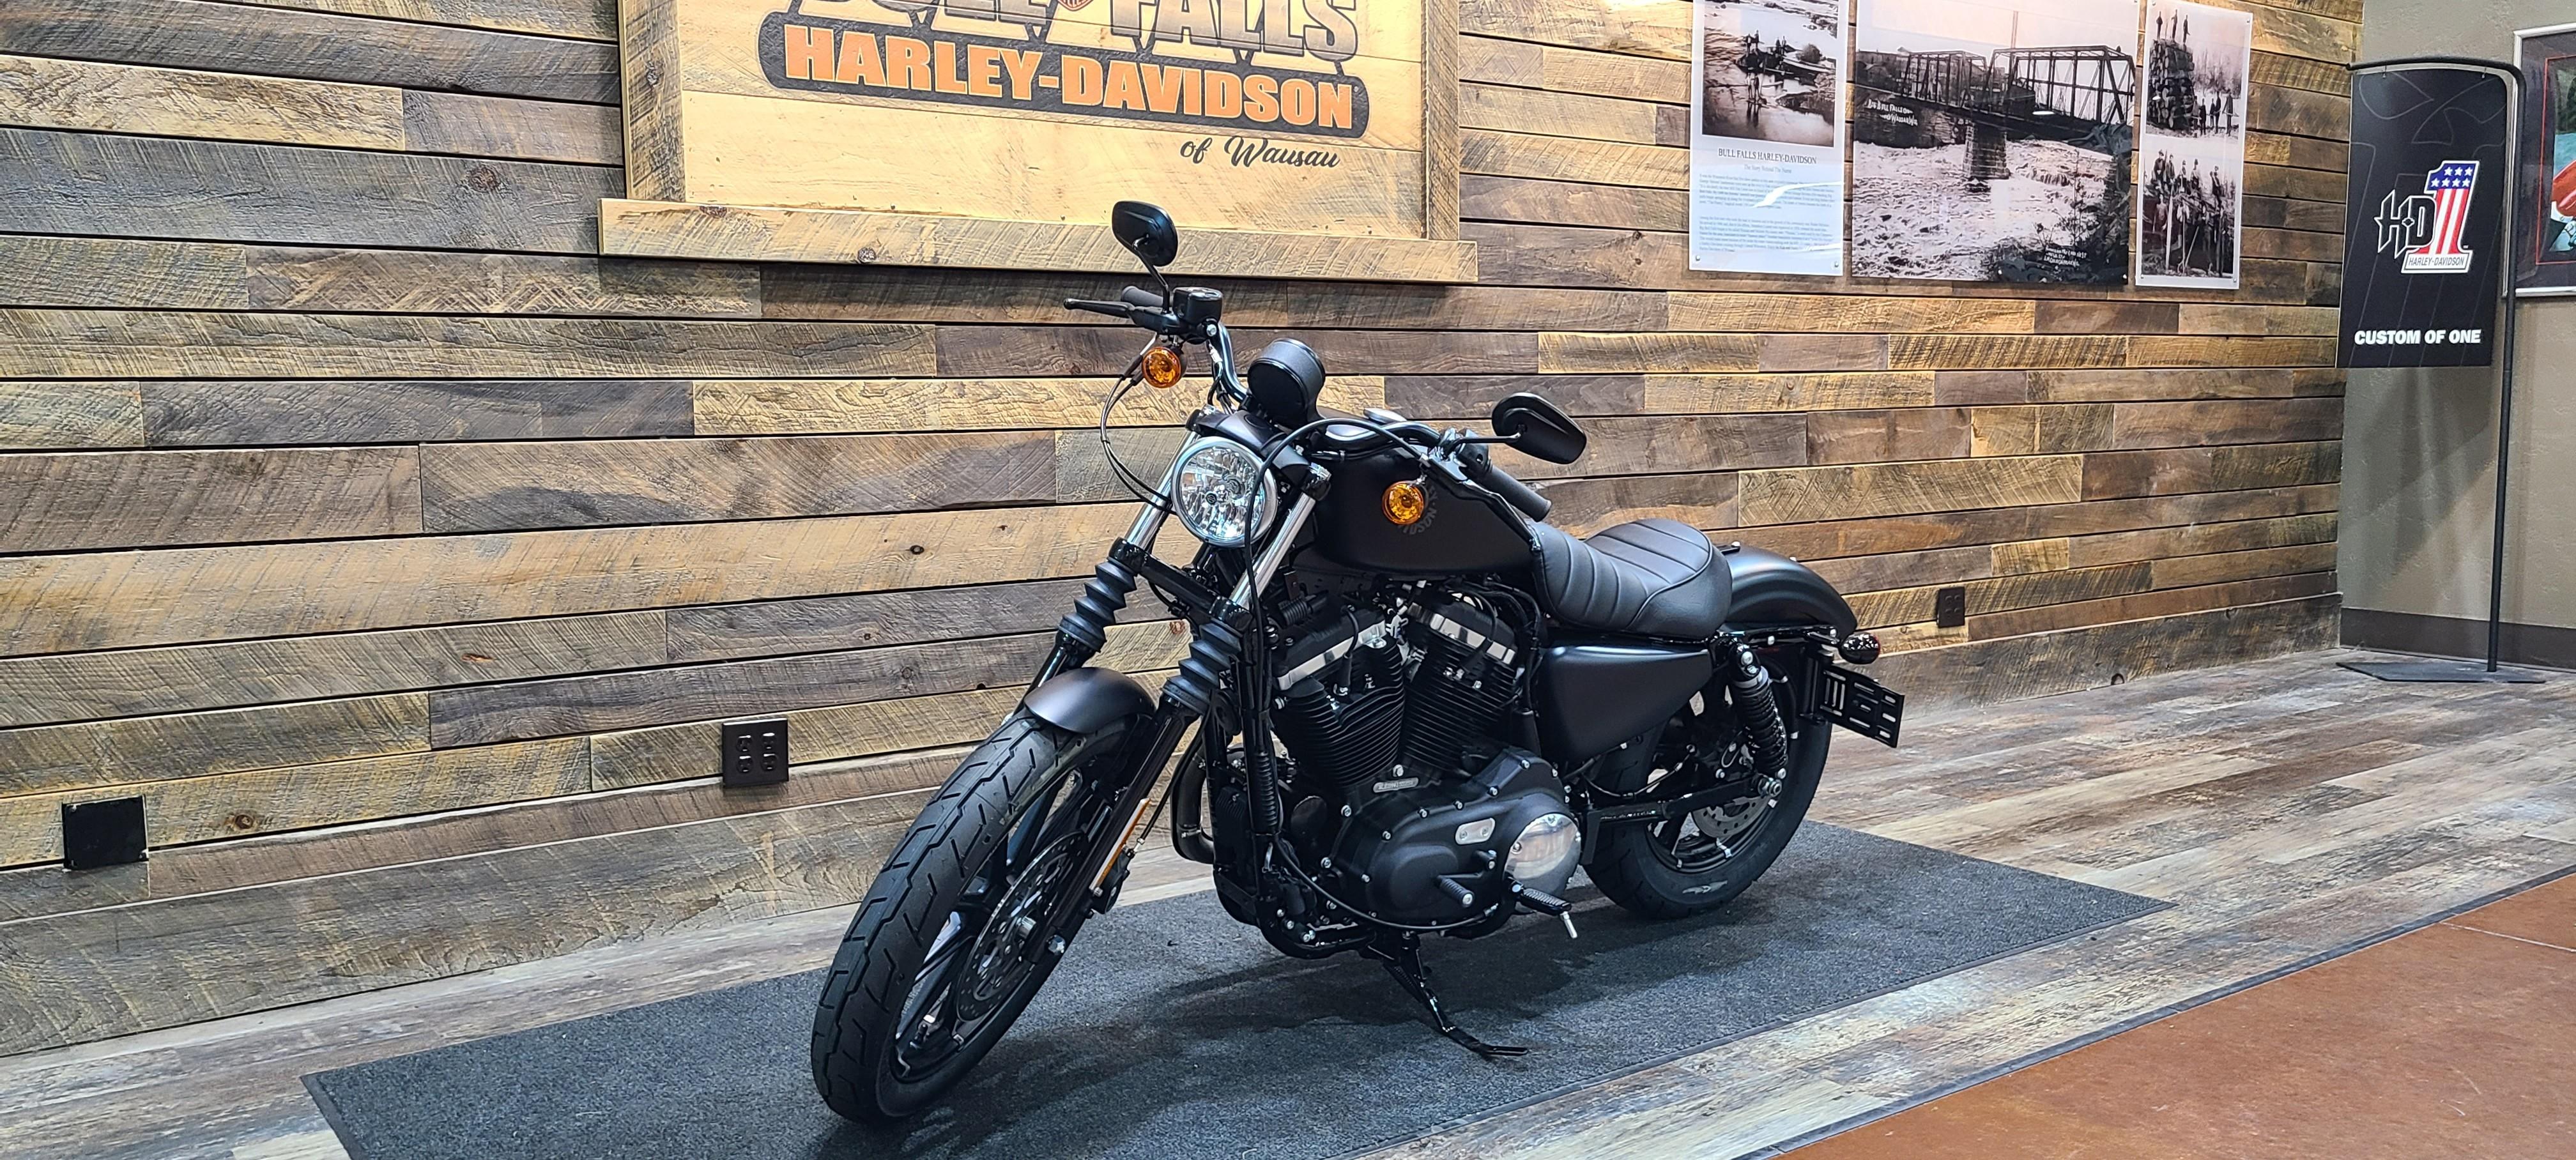 2021 Harley-Davidson Cruiser XL 883N Iron 883 at Bull Falls Harley-Davidson